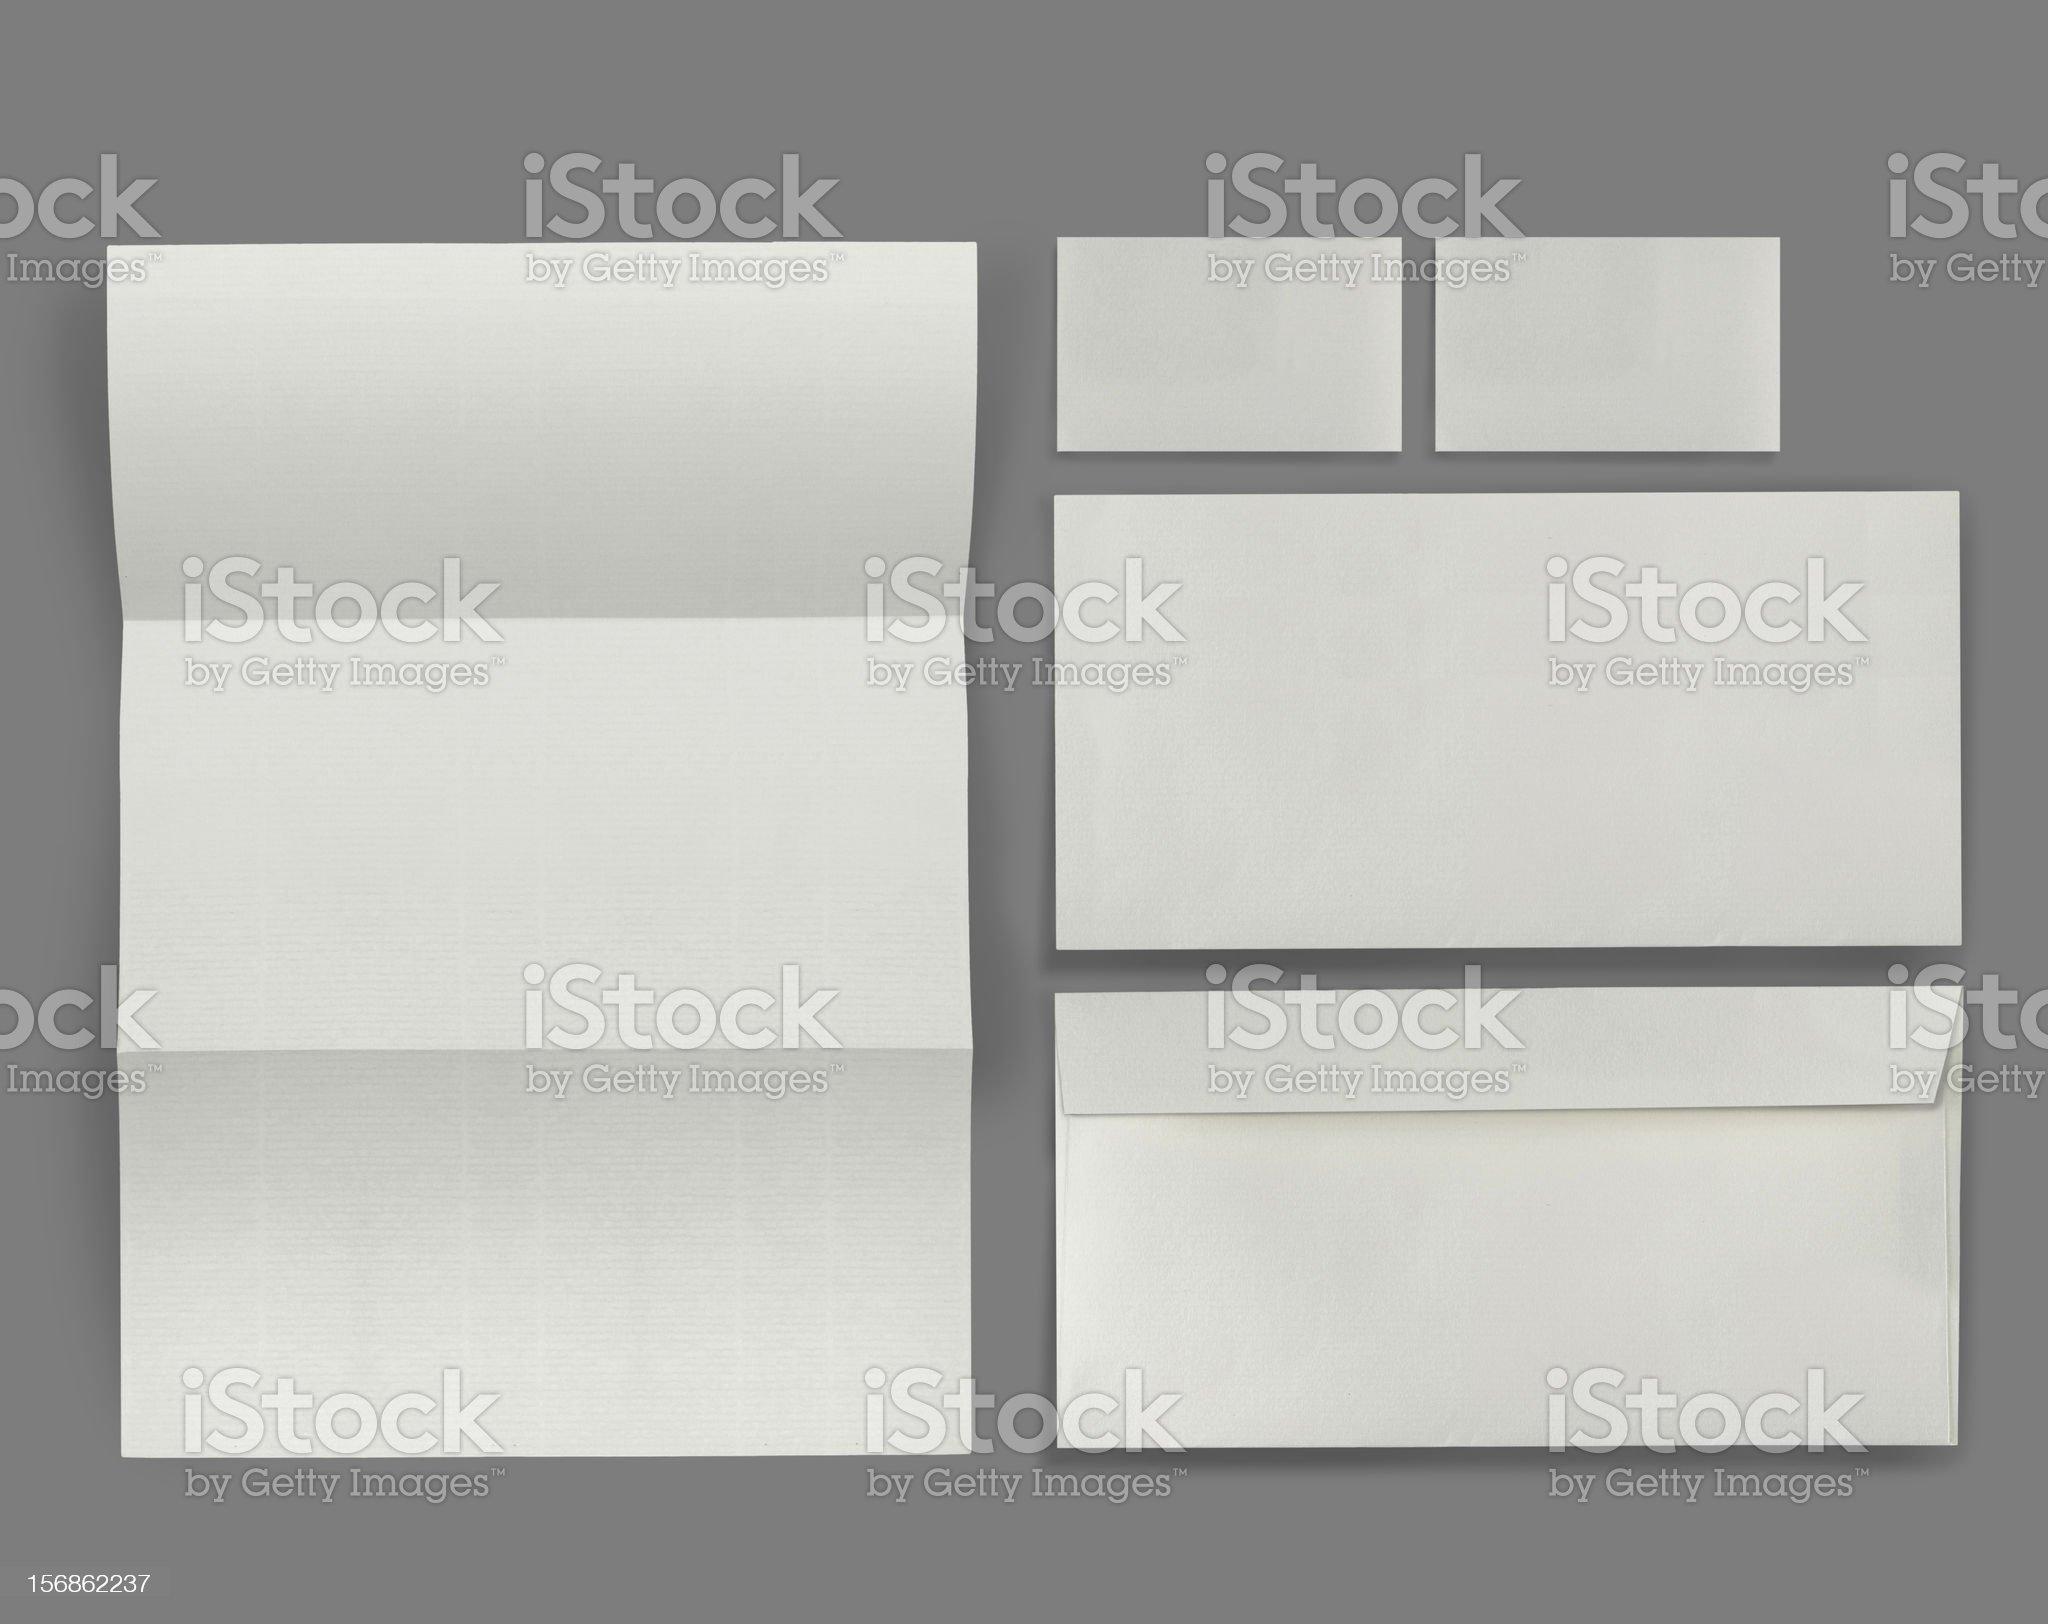 set of corporate identity royalty-free stock photo